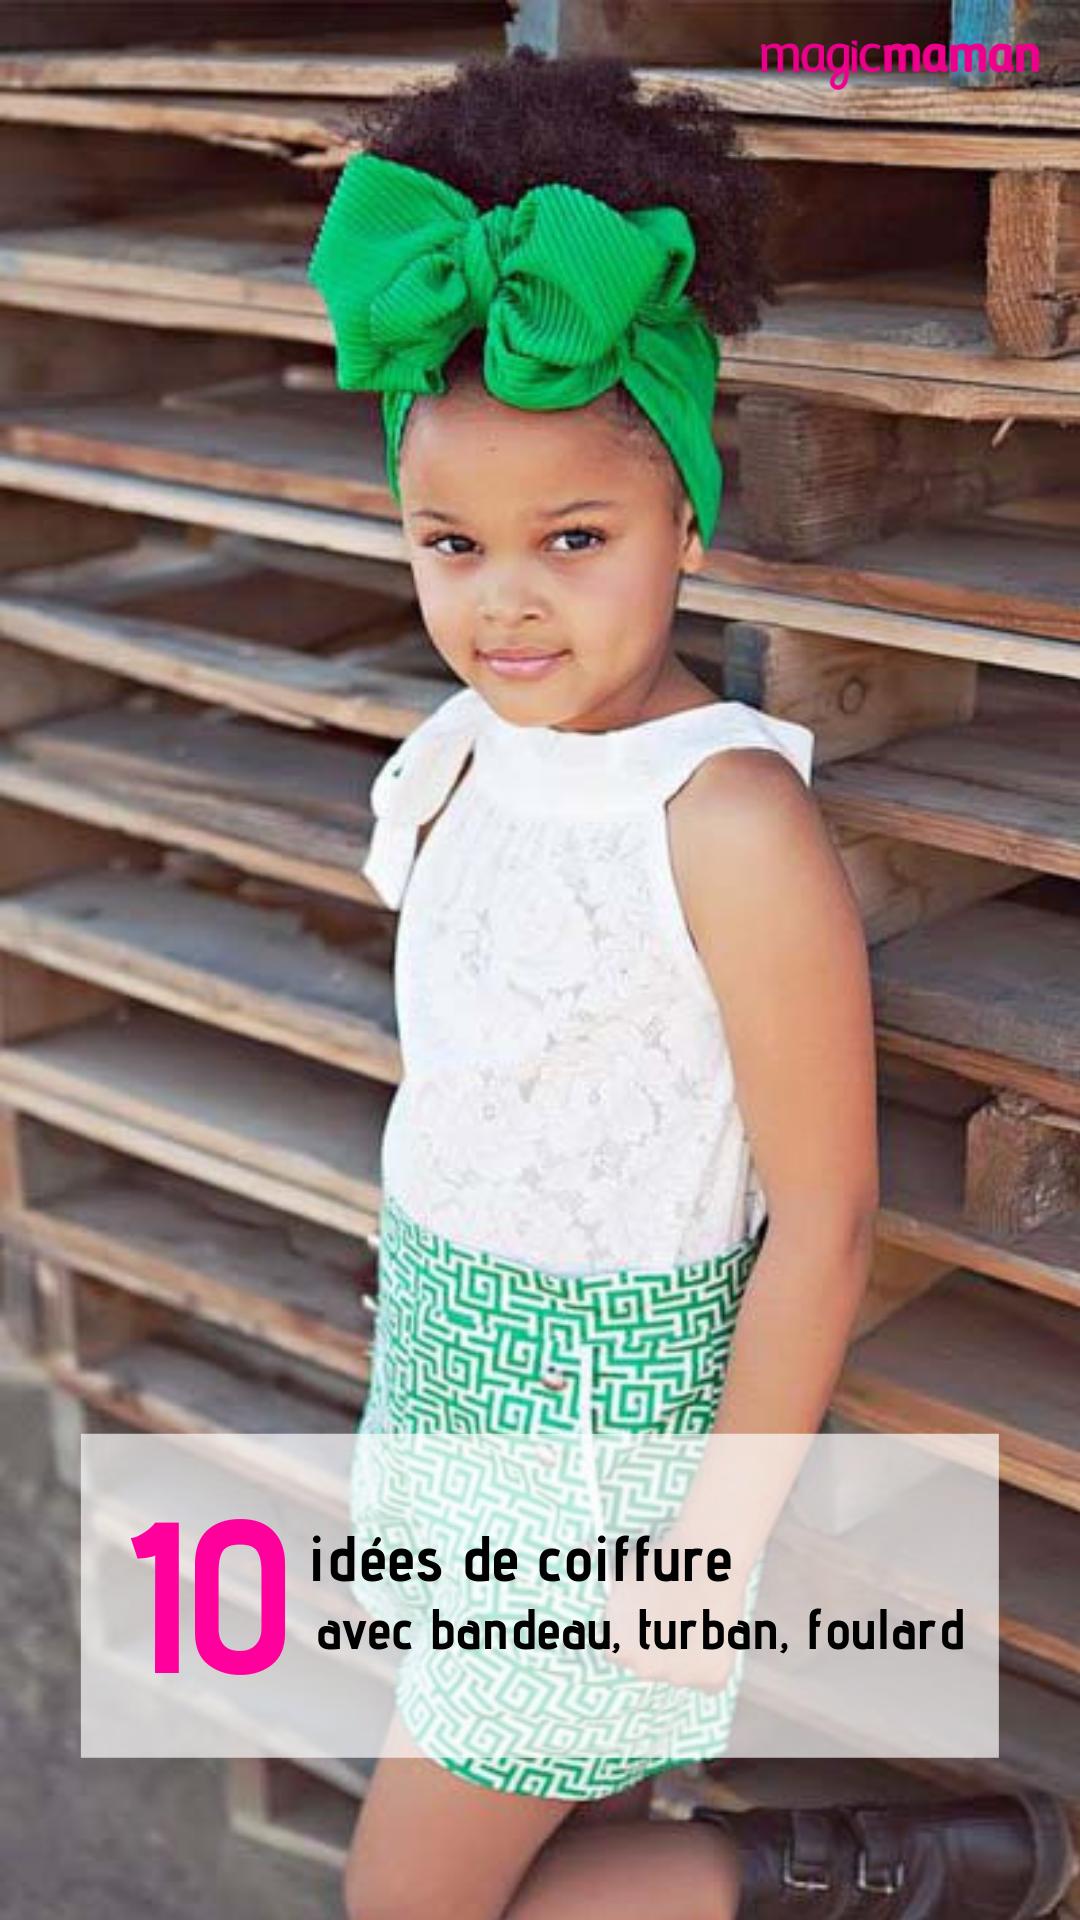 Bandeau Turban Foulard 10 Idees De Coiffure Pour Votre Petite Fille Coiffure Avec Bandeau Idees De Coiffures Turban